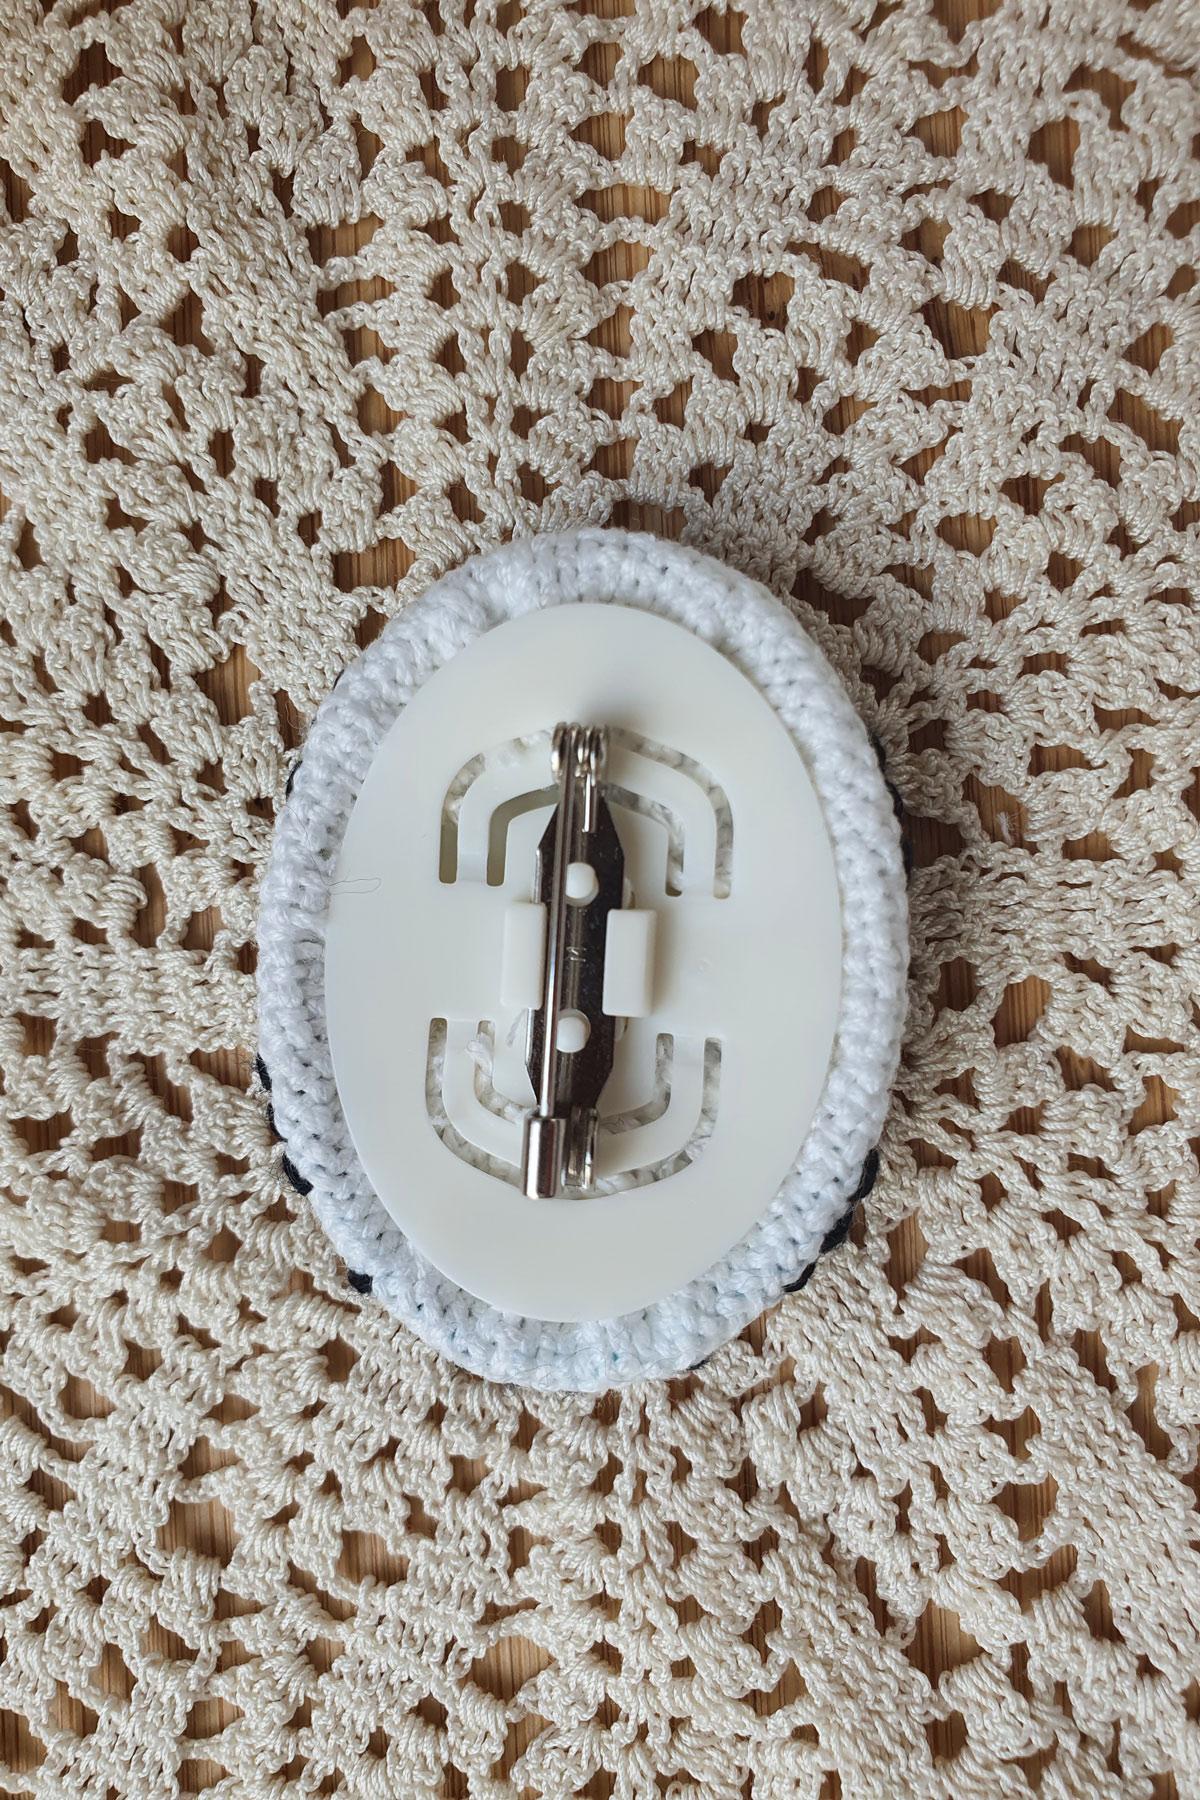 Kogin buttons